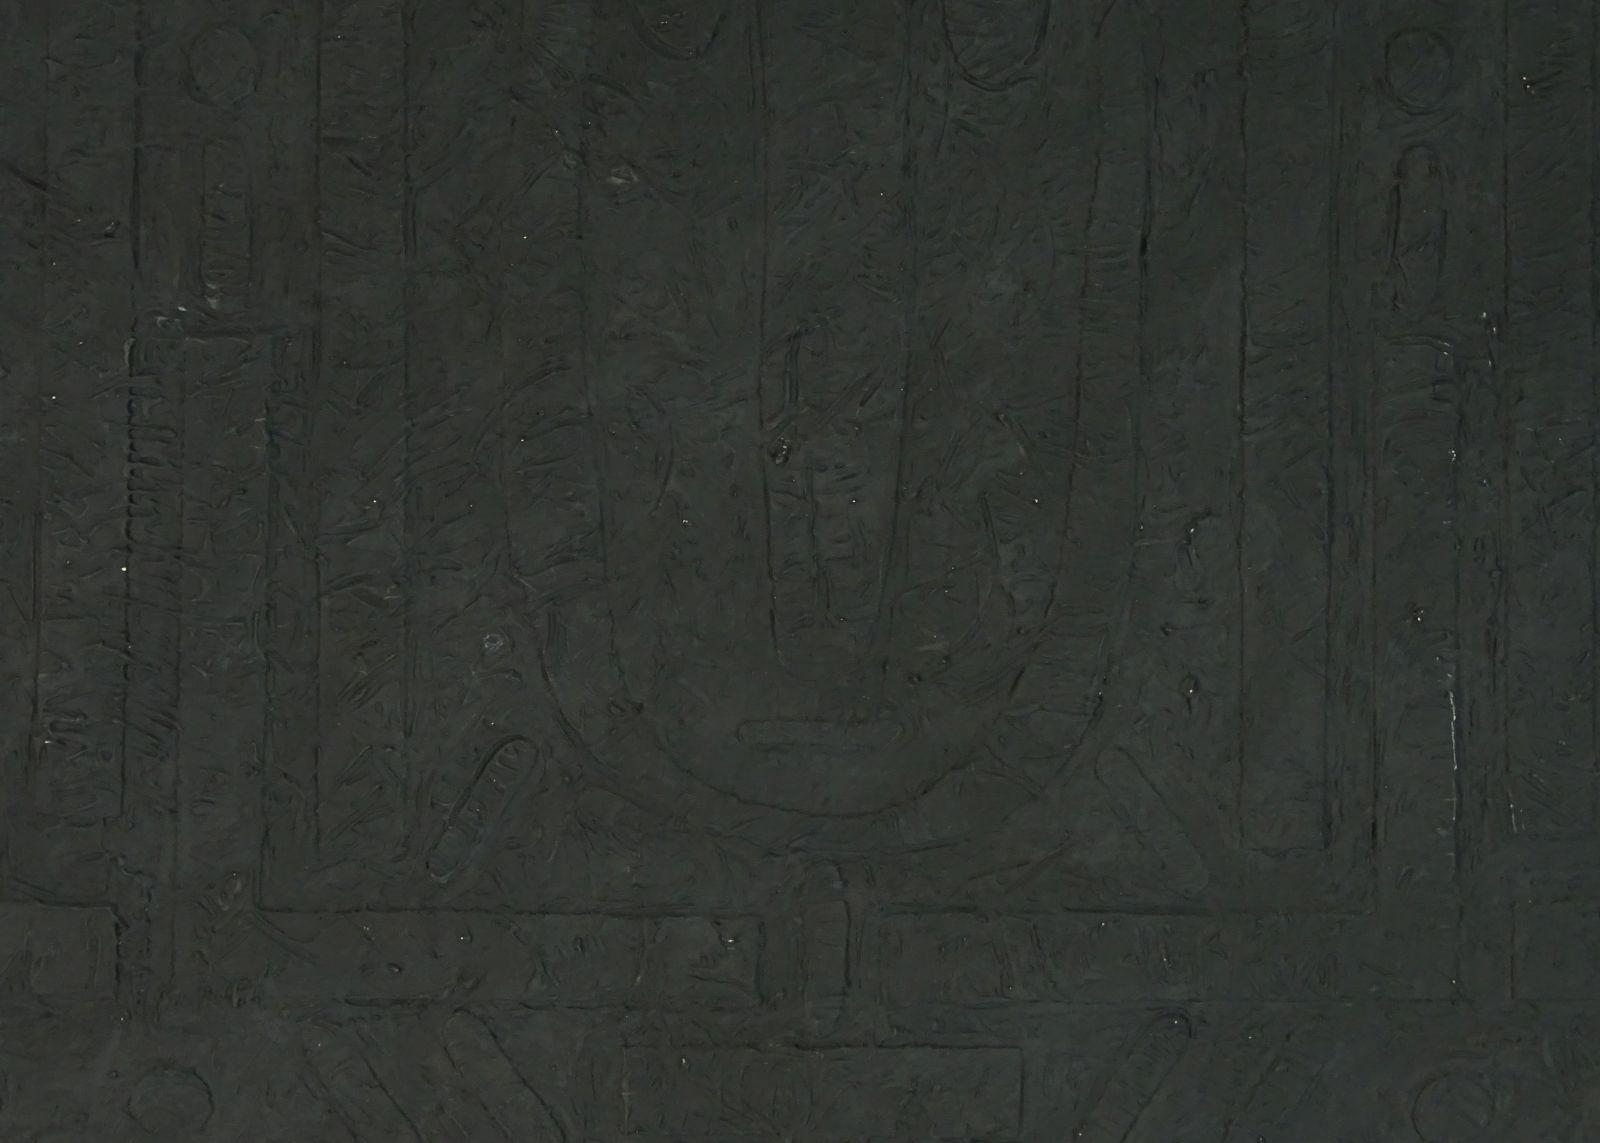 DSC09310.JPG (1600×1143)